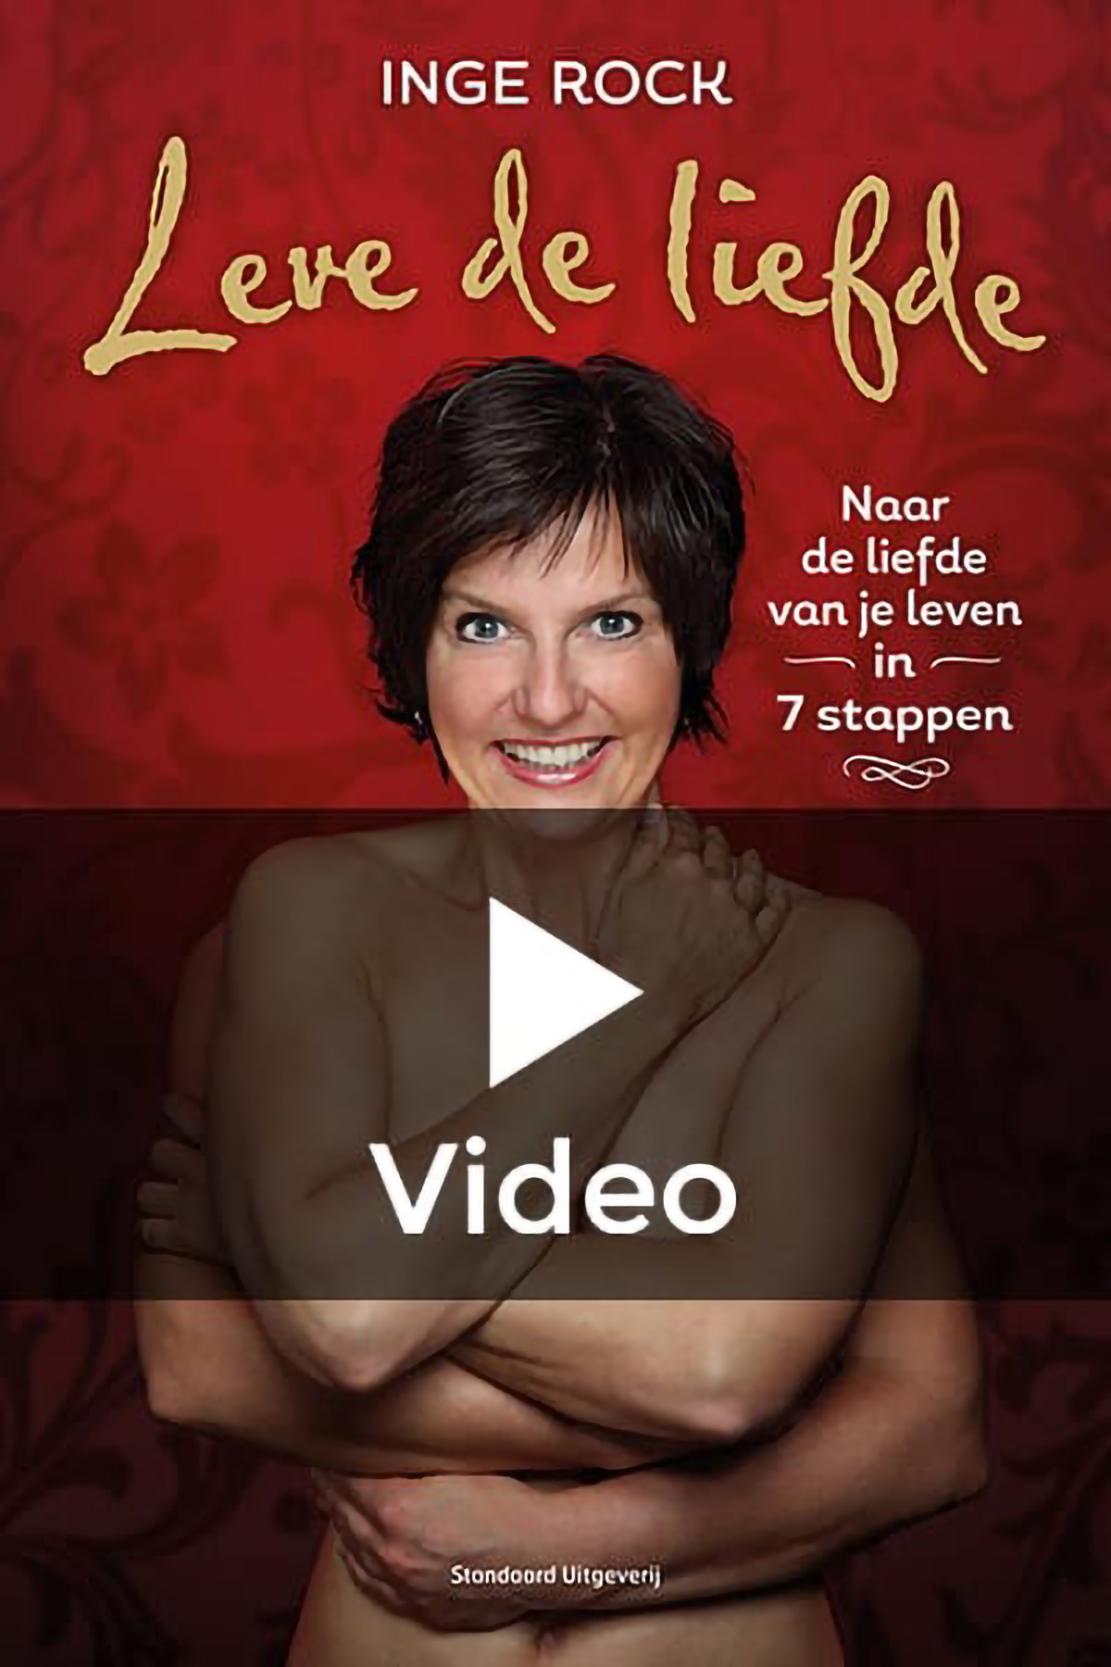 video-leve-de-liefde-shop-item